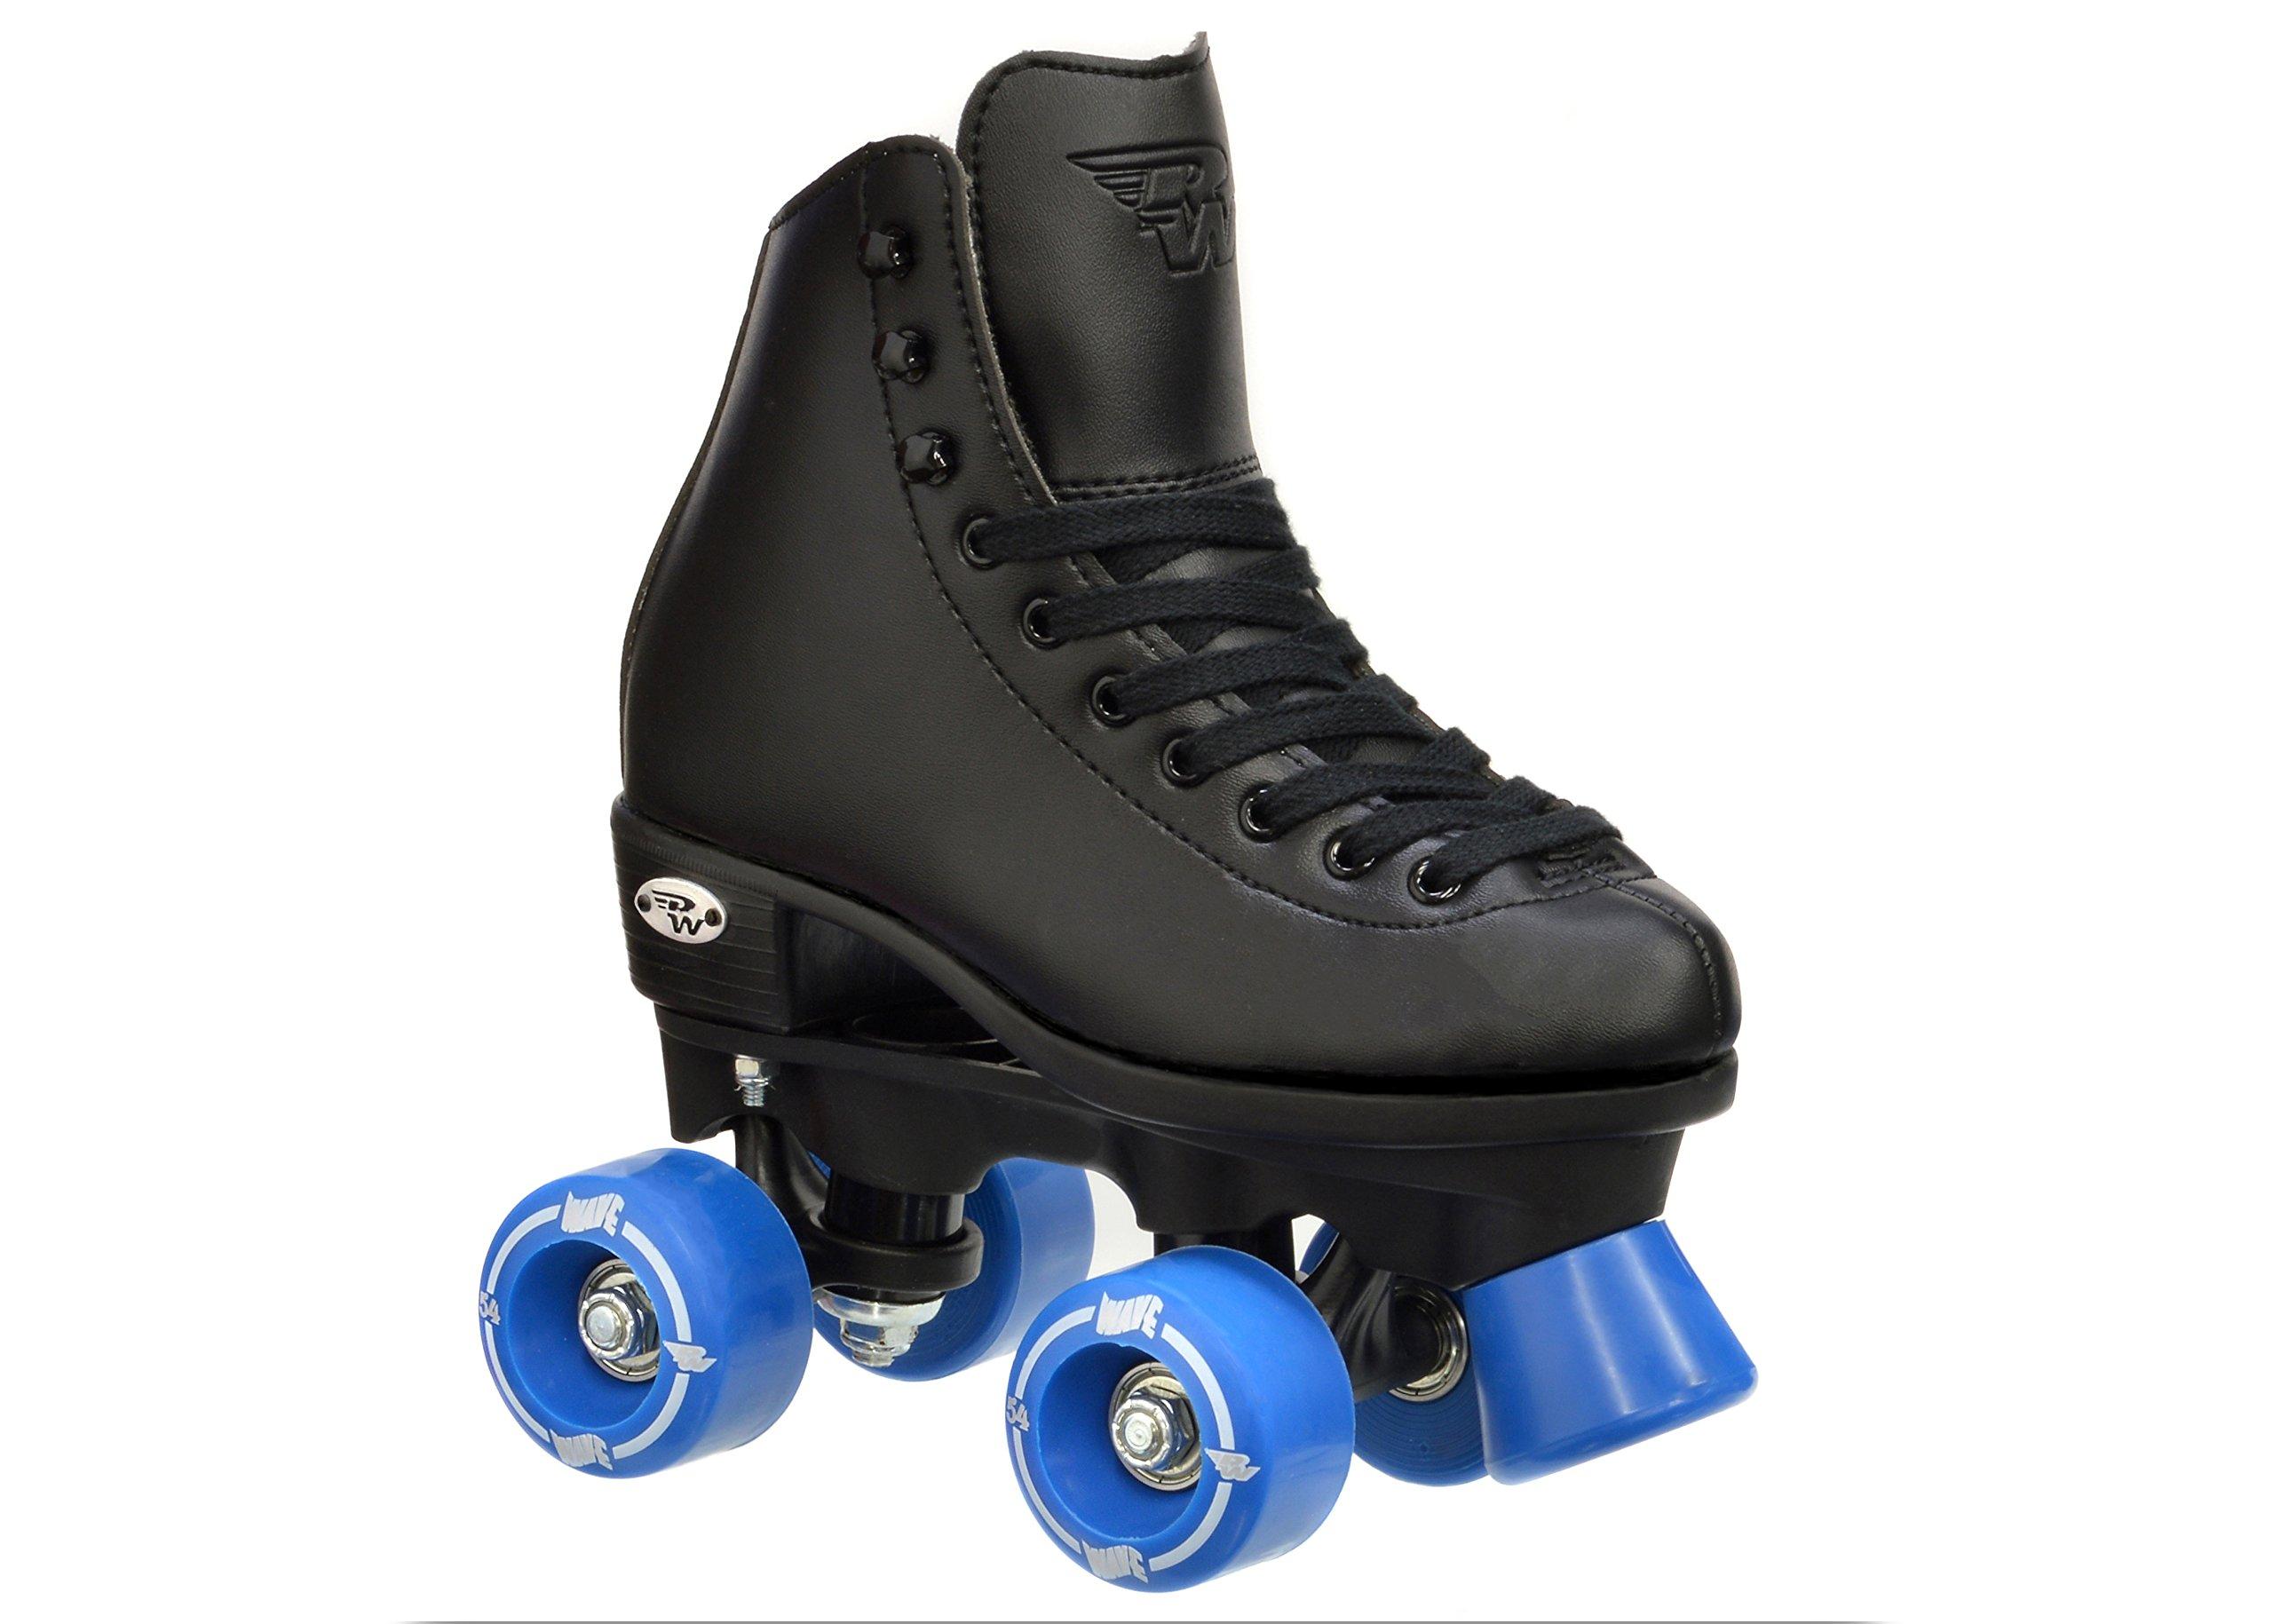 Riedell Wave Boys Black Skates - Riedell Wave Black Quad Roller Skates by Riedell